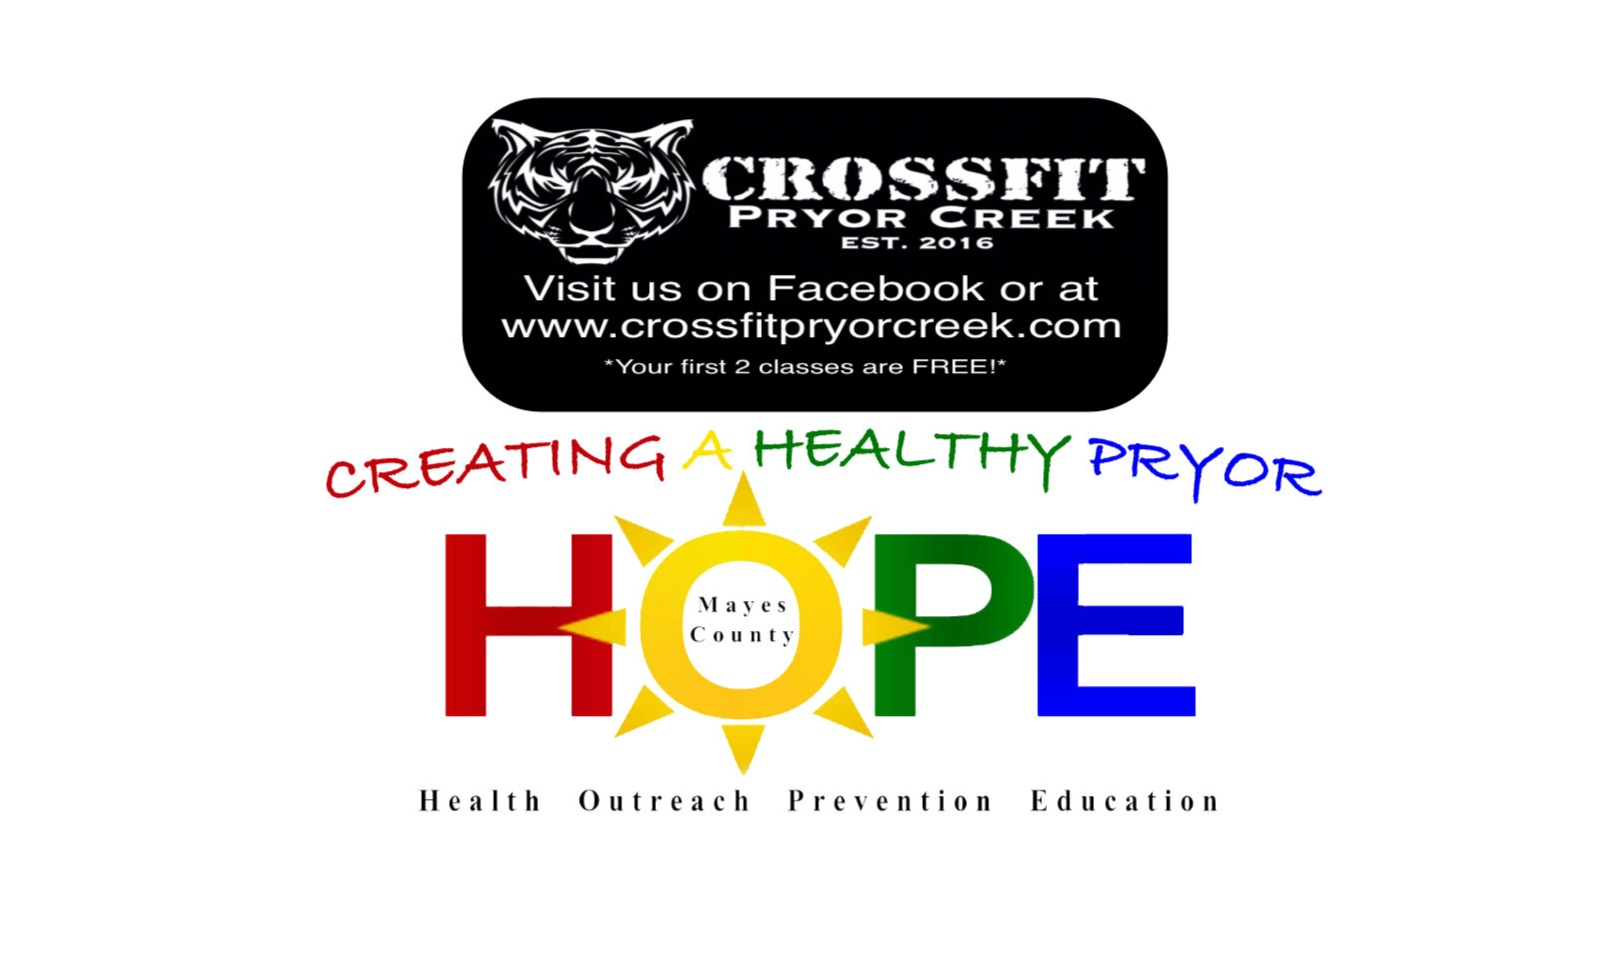 CREATING+A+HEALTHY+PRYOR+SERIES+GRAPHIC+rev+3.jpg